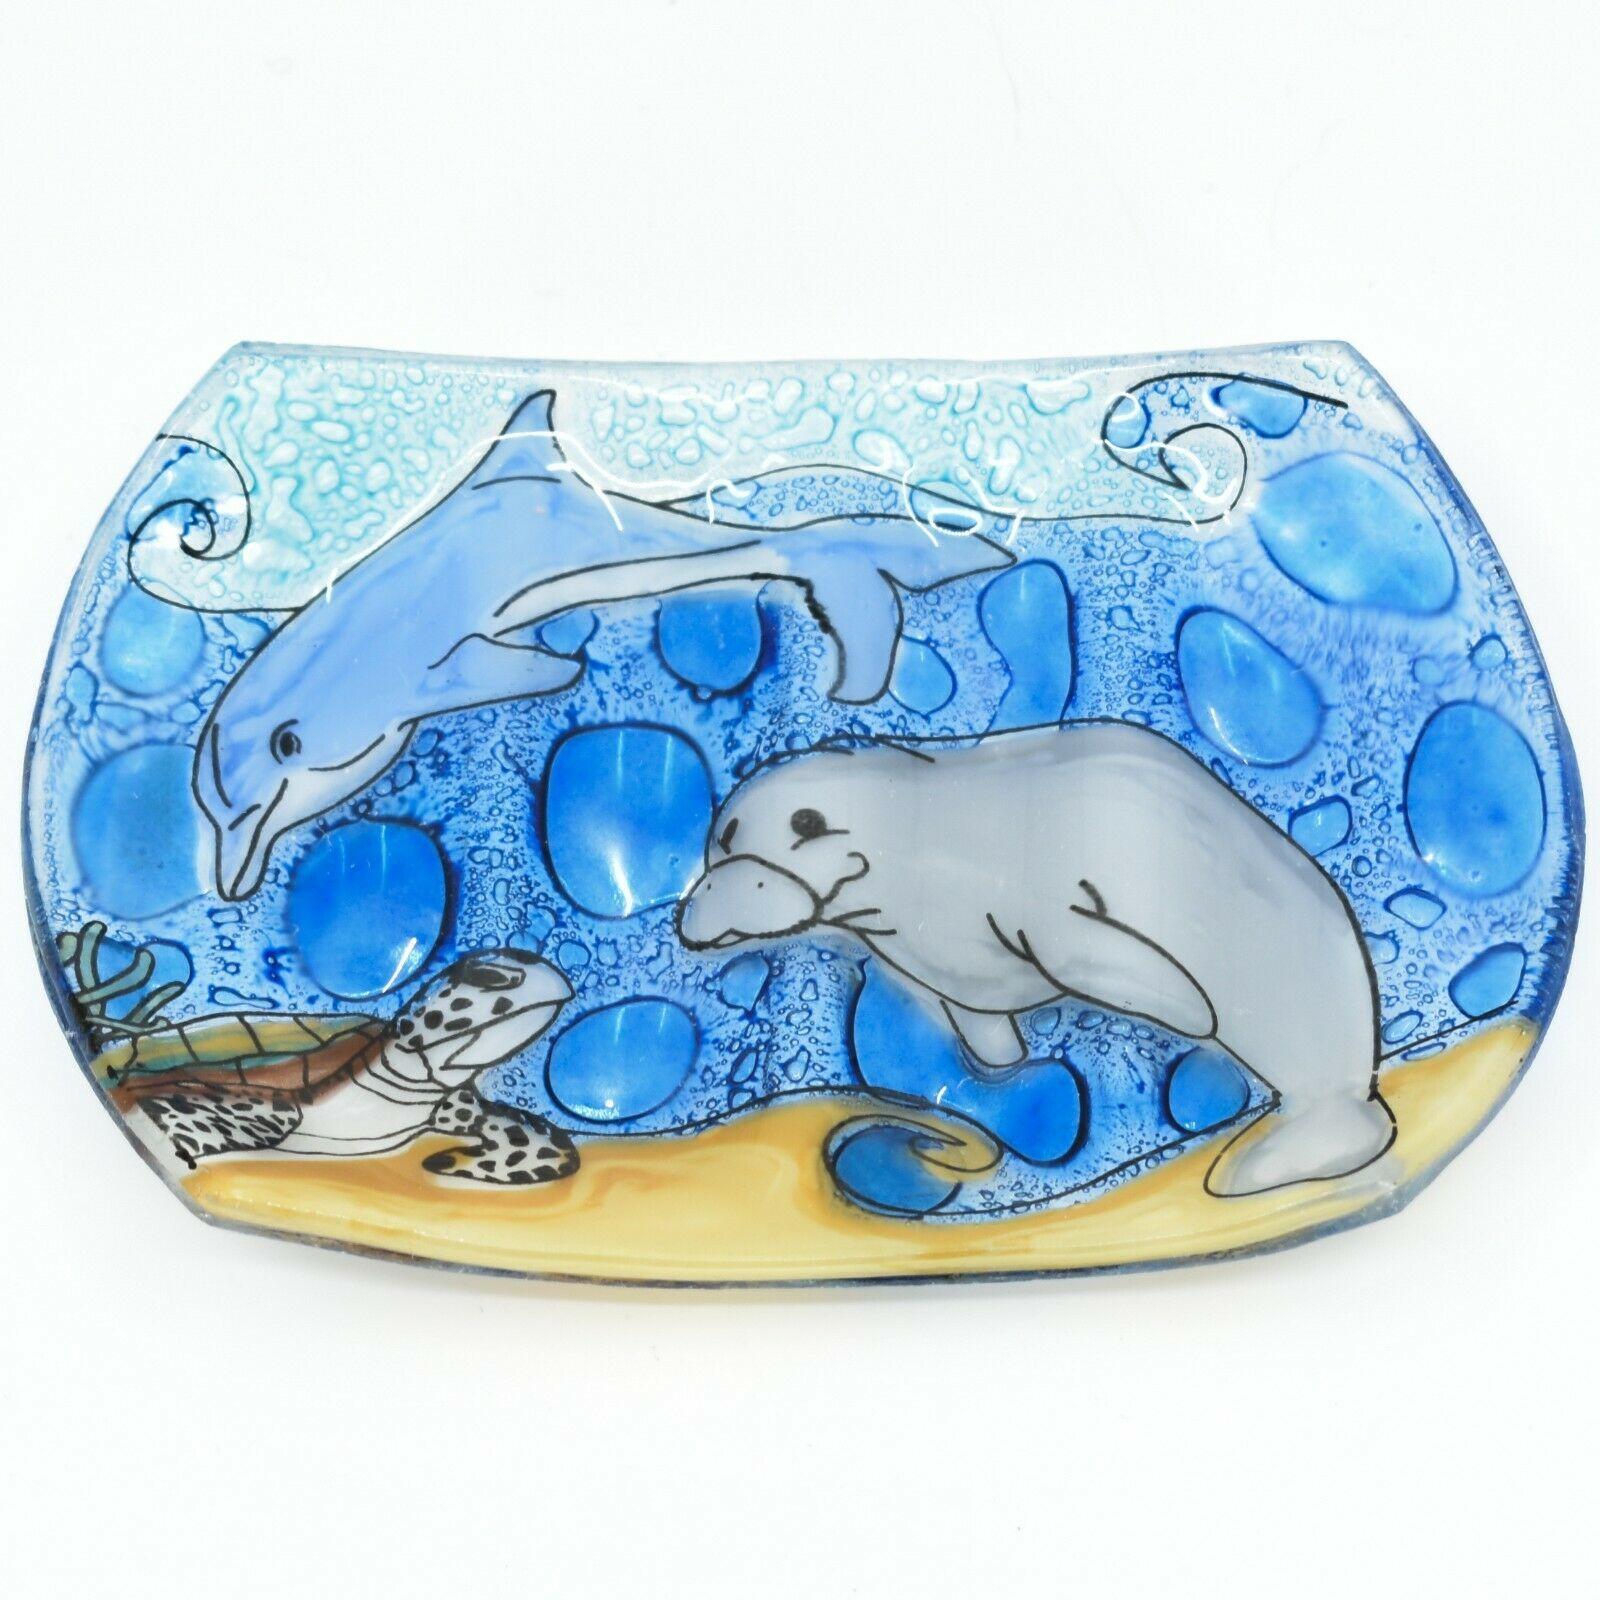 Fused Art Glass Sea Turtle Dolphin Manatee Ocean Soap Dish Handmade in Ecuador